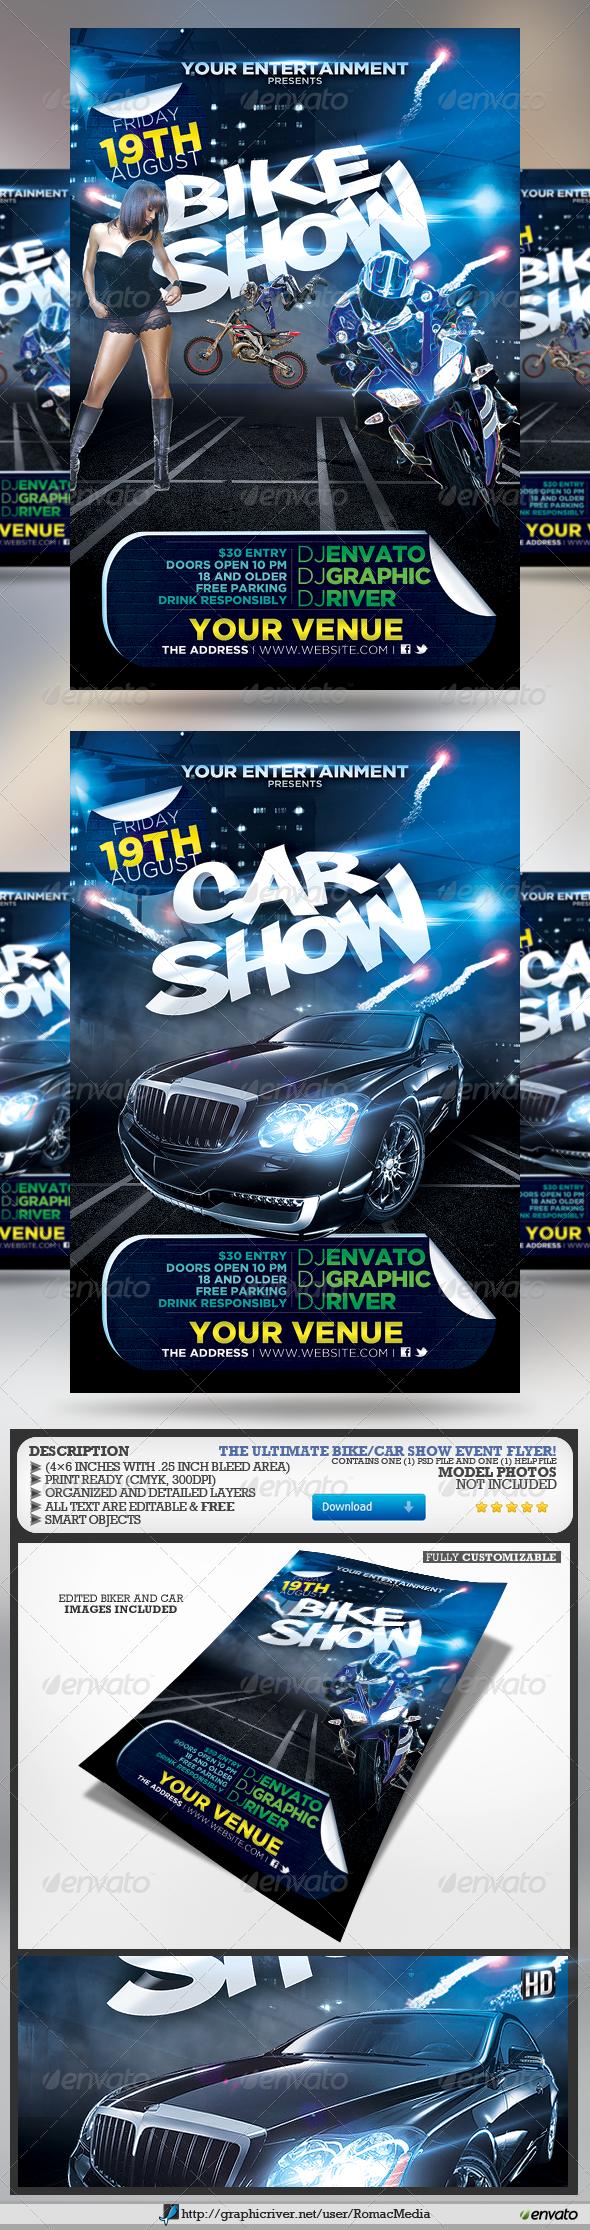 Bike And Car Show Flyer By RomacMedia Bike And Car Show Event Flyer - Car and bike show flyer template